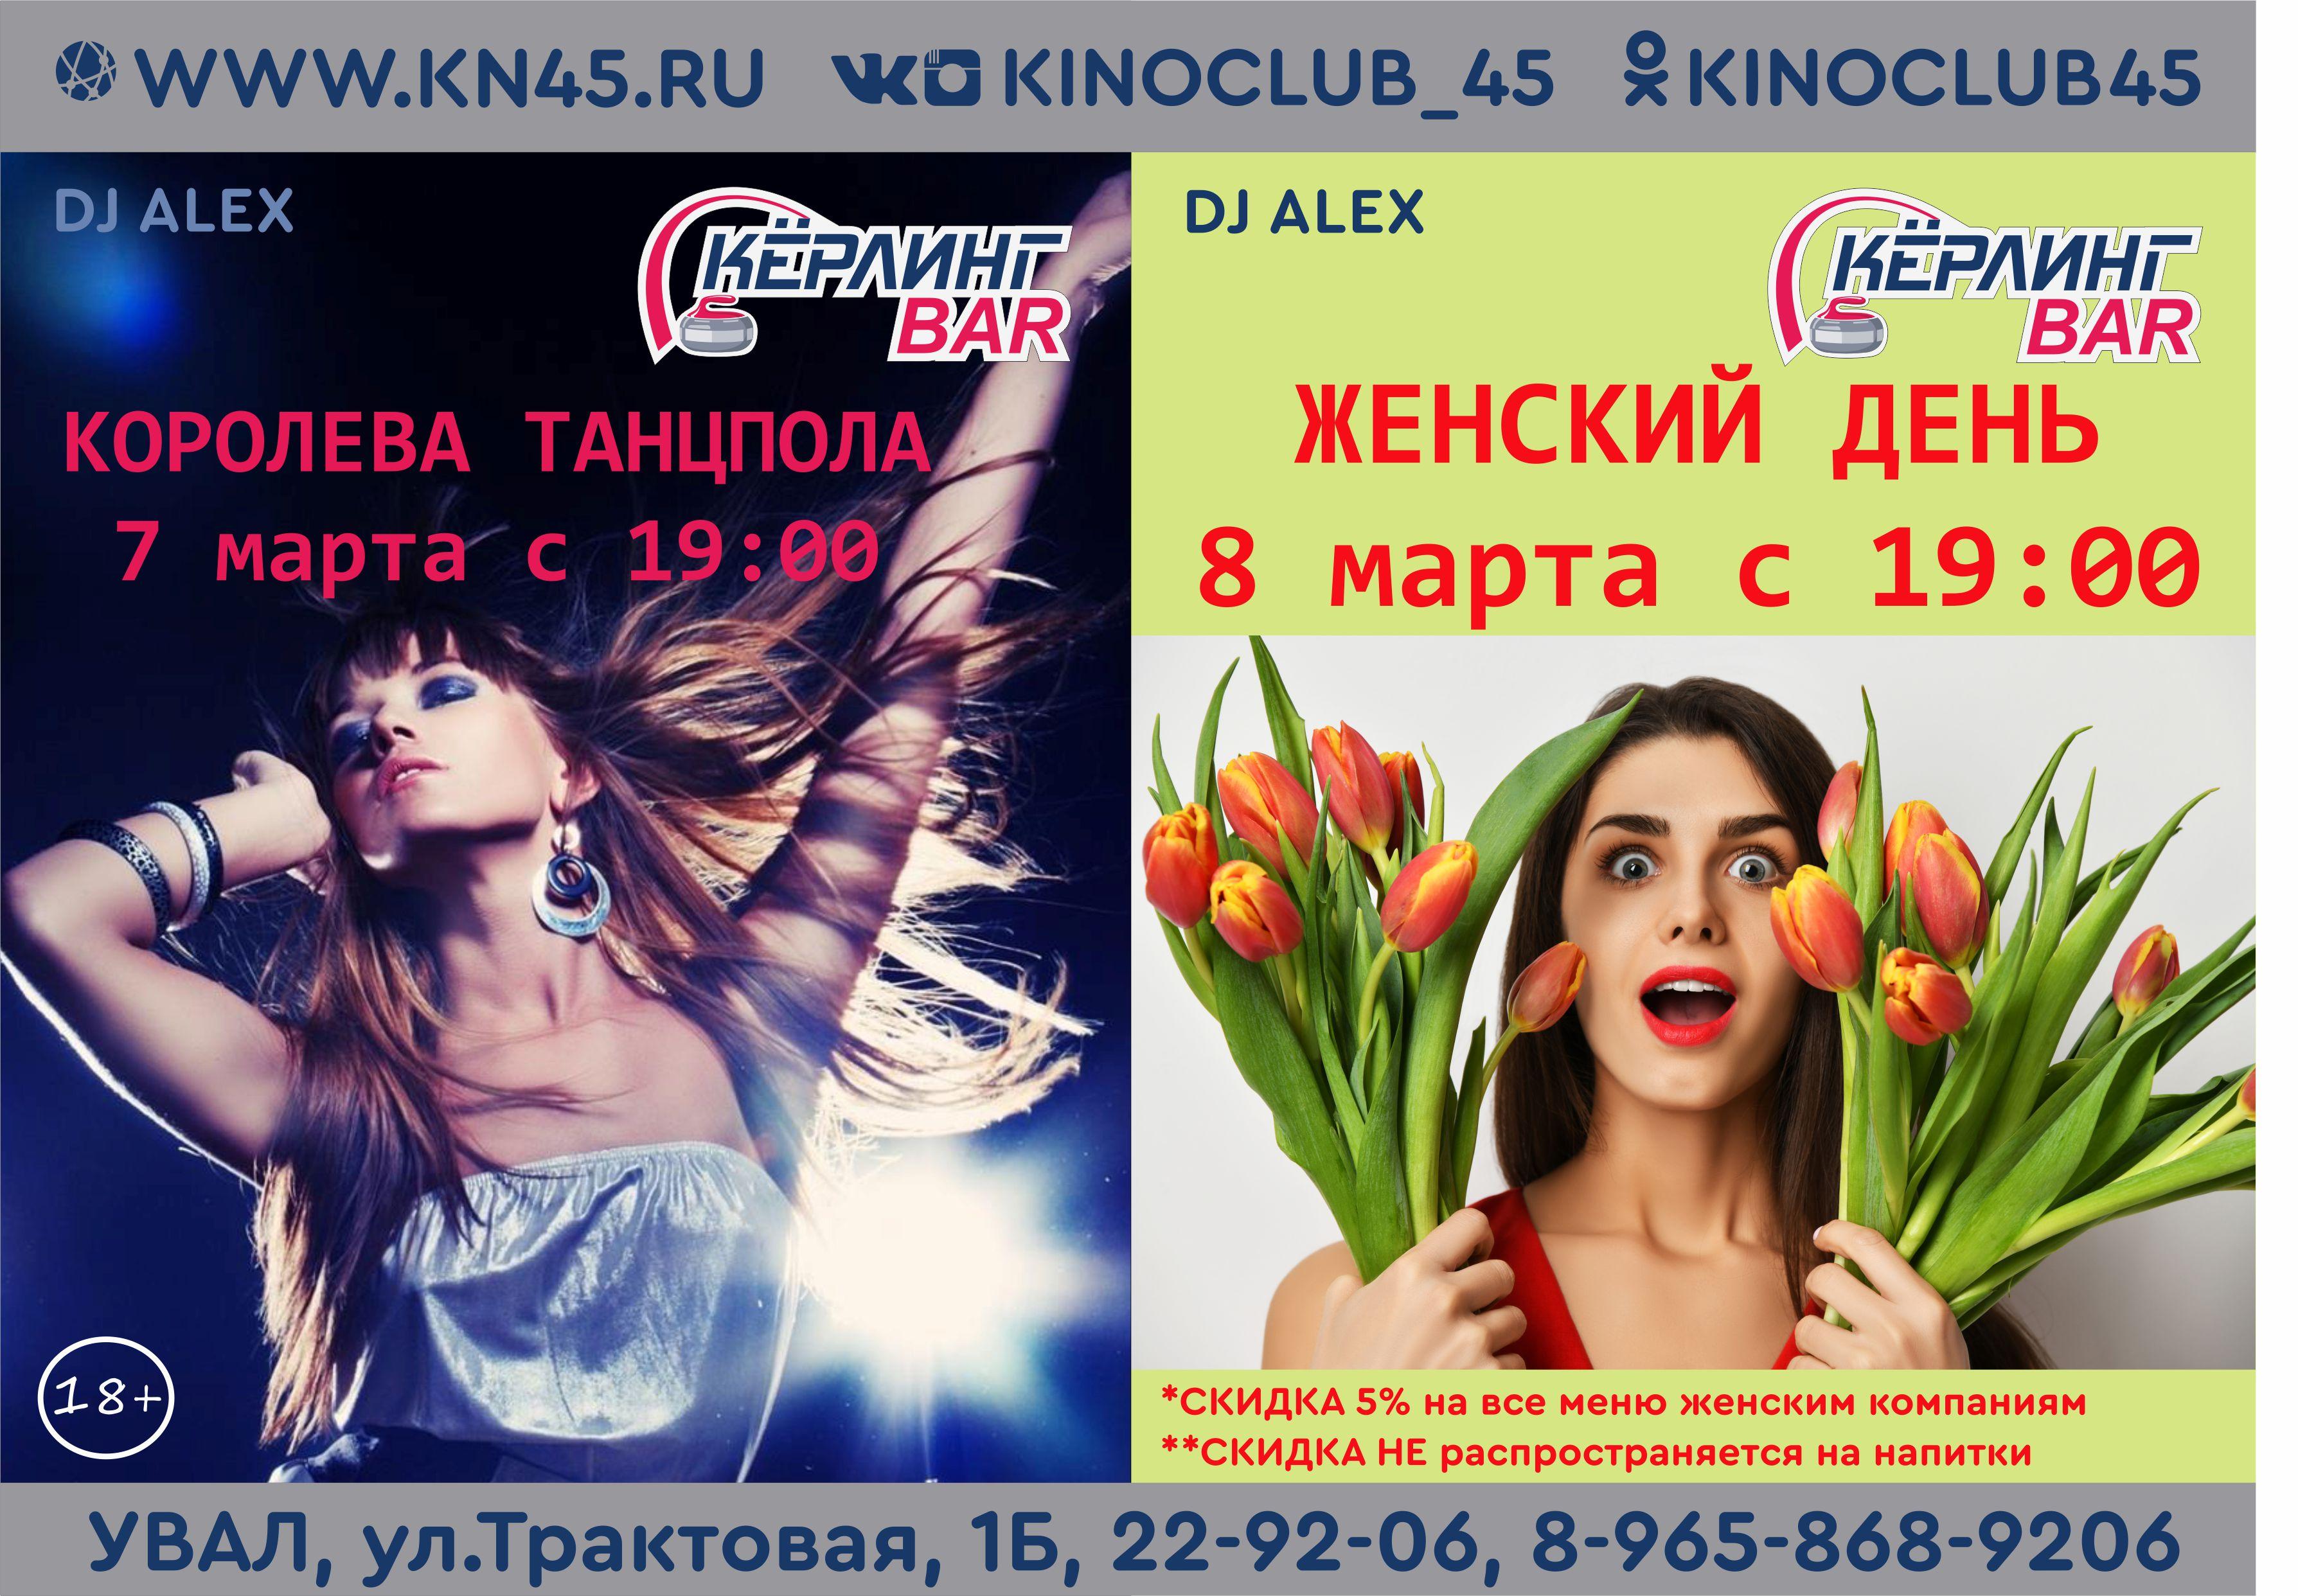 А3 7-8 марта.jpg (871 KB)